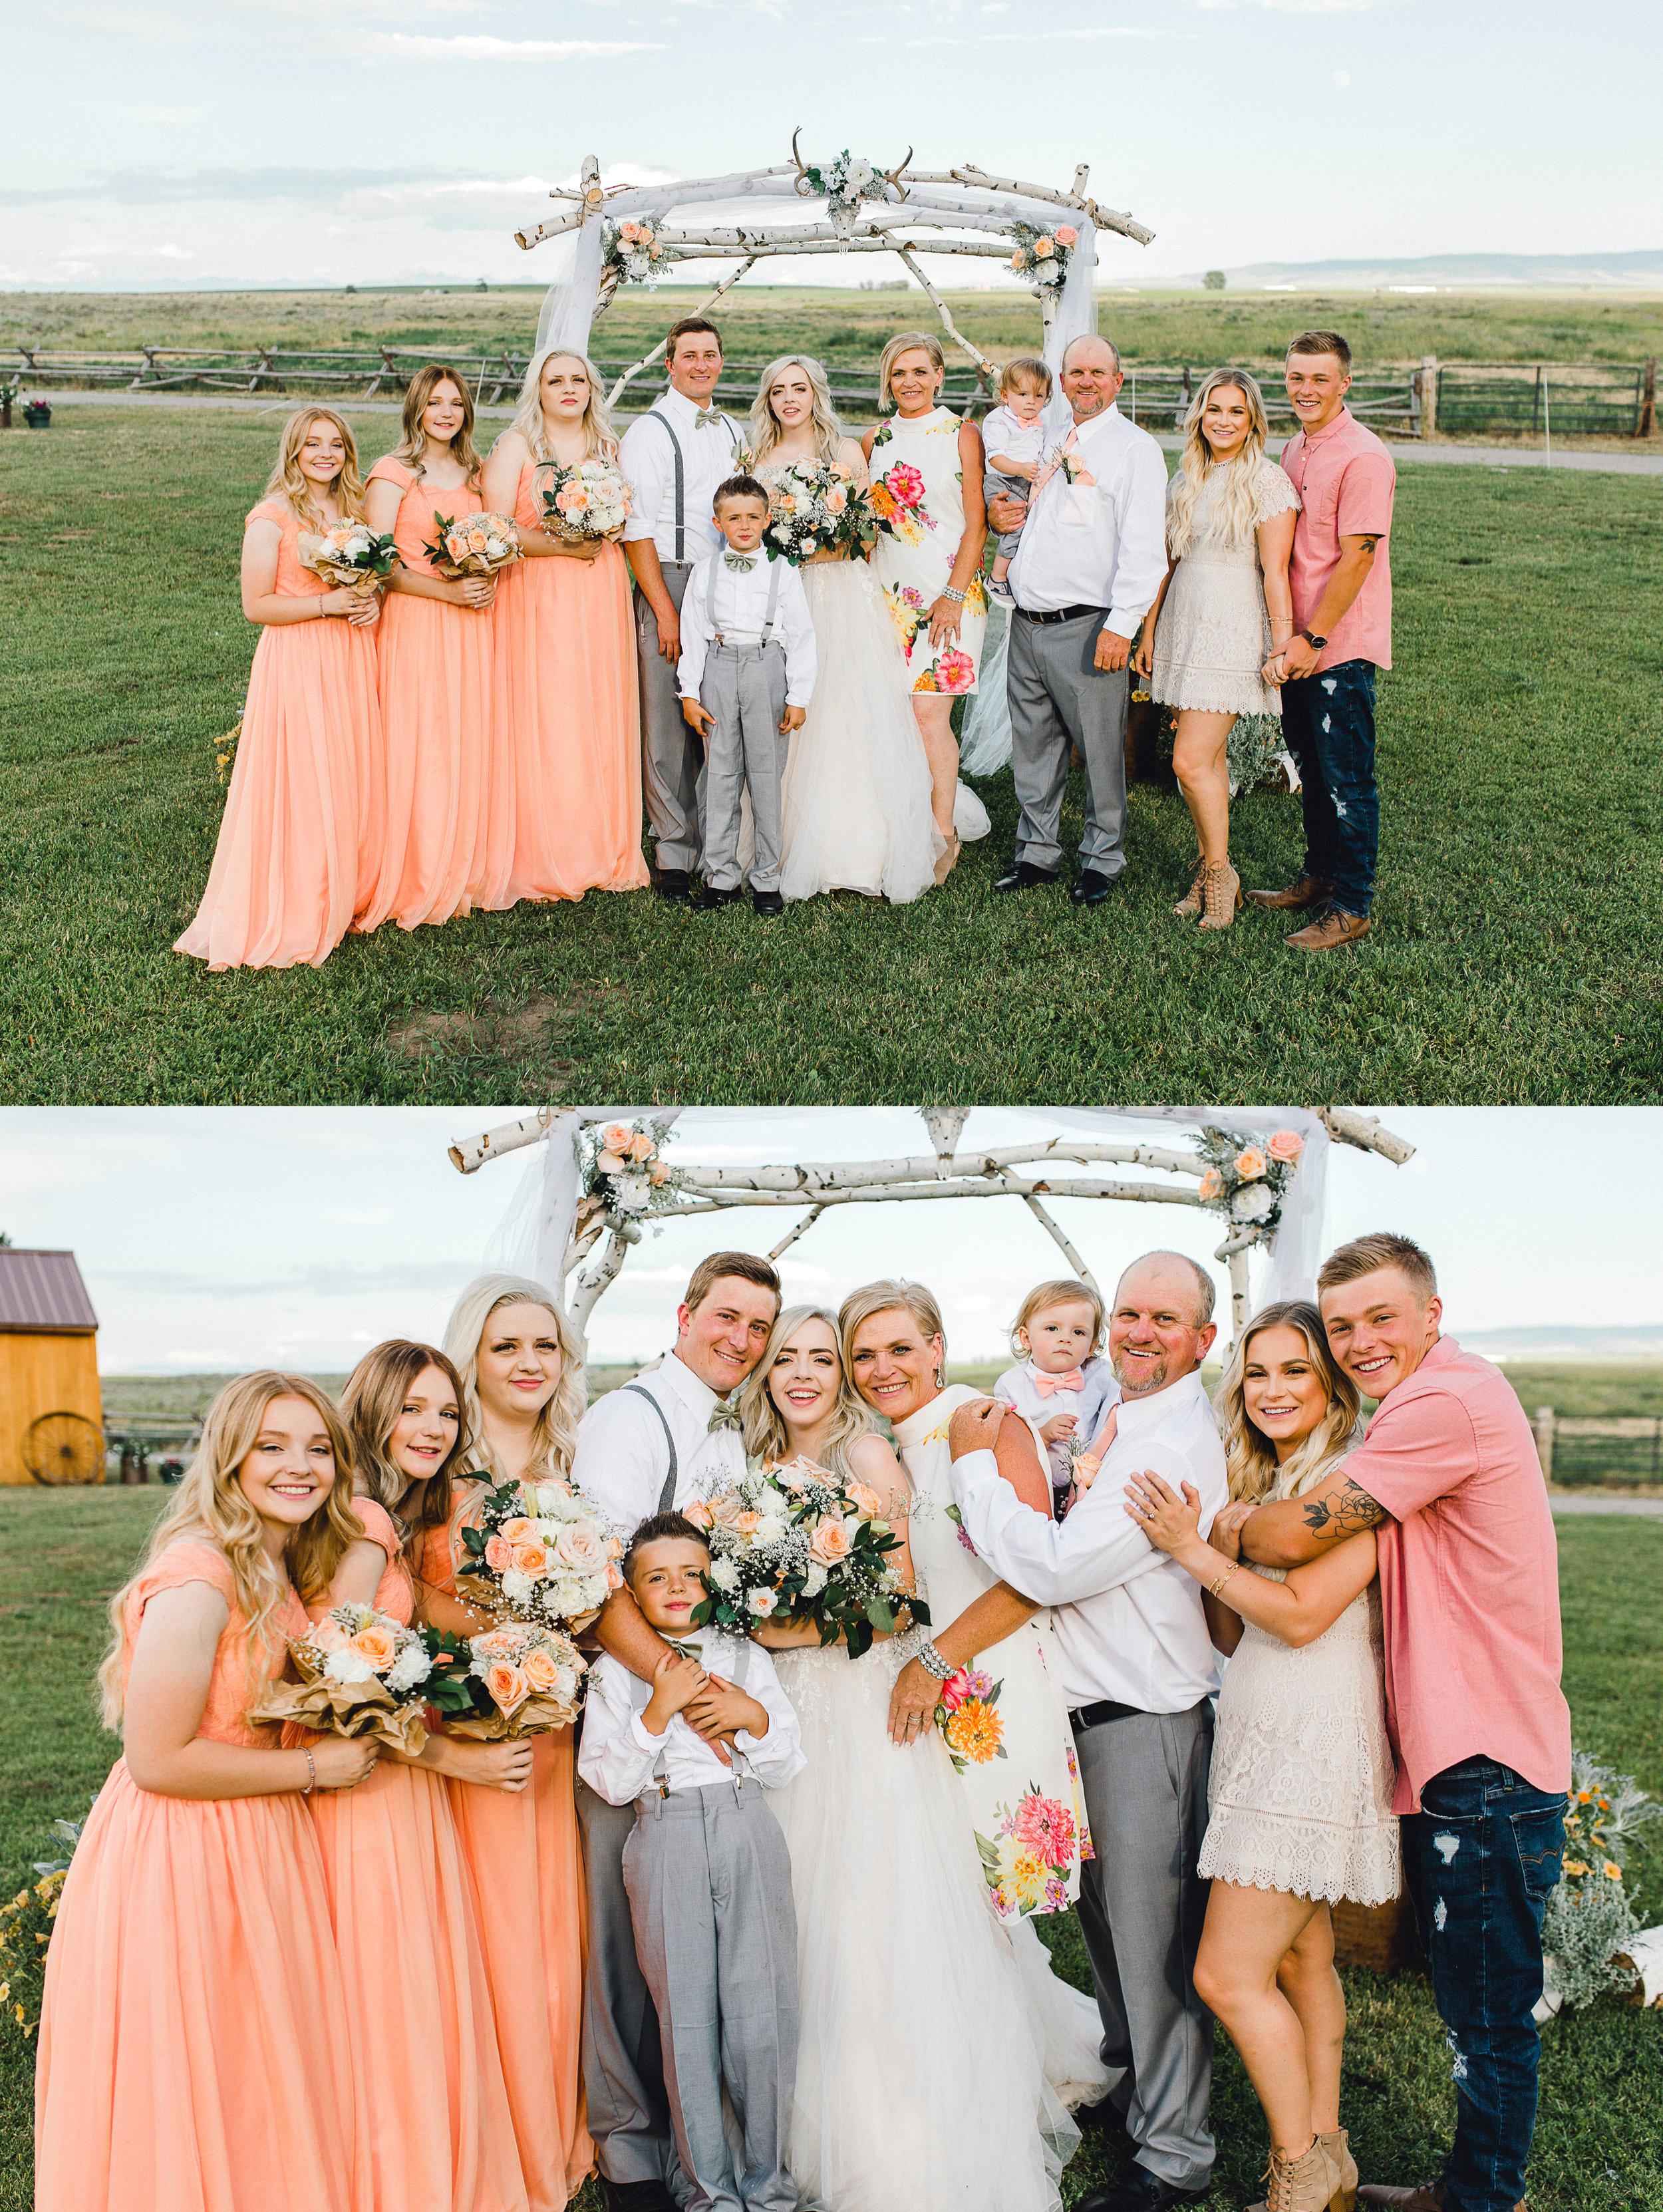 country-outdoor-rustic-wedding-tetons-idaho-anna-christine-photo-28.jpg